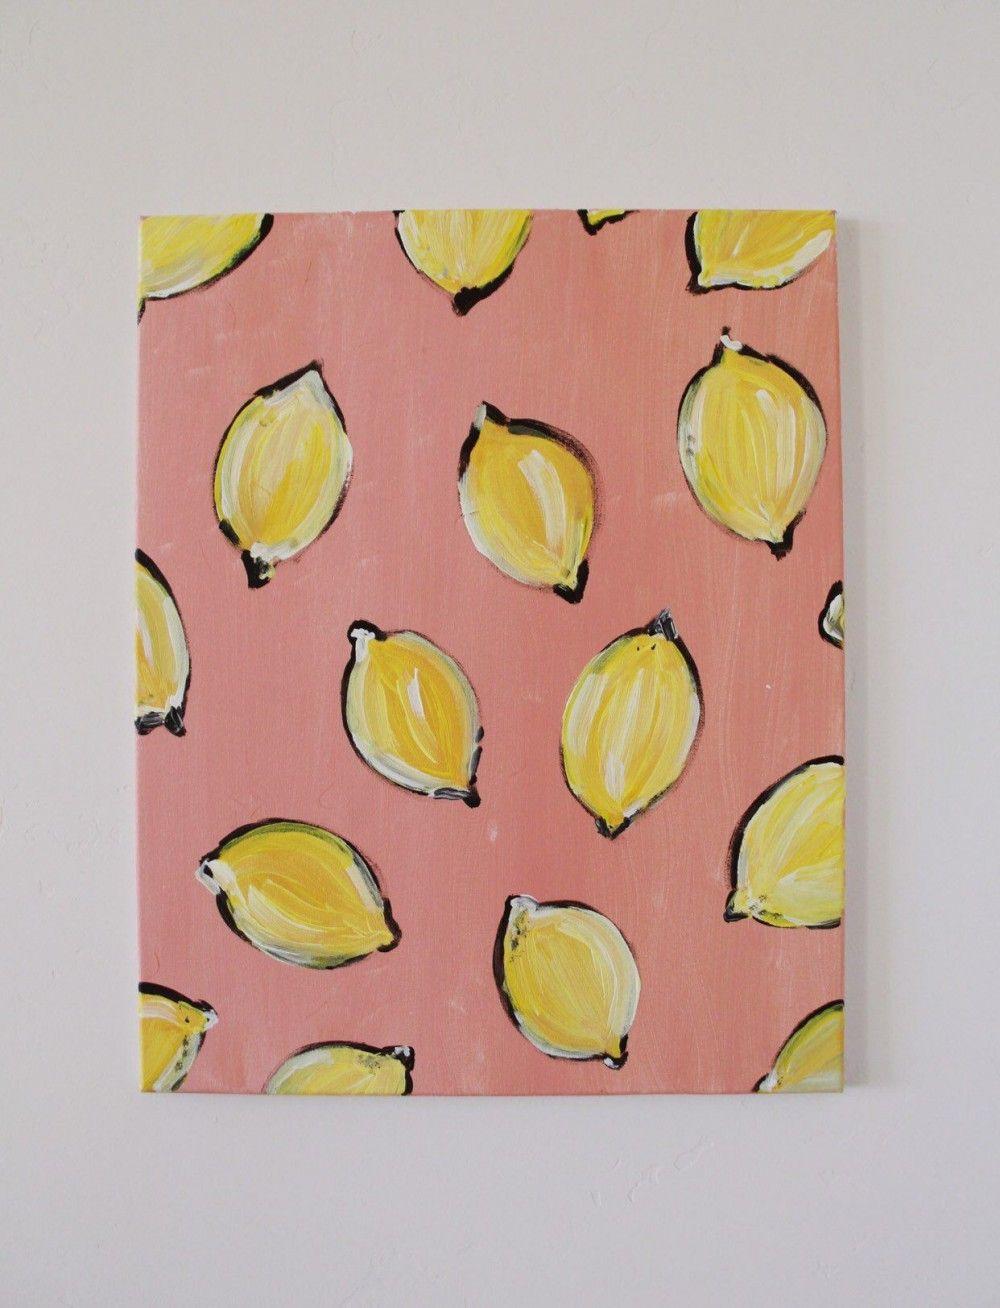 Spongebob Aesthetic Painting Ideas Cute Paintings Easy Tumblr Novocom Top